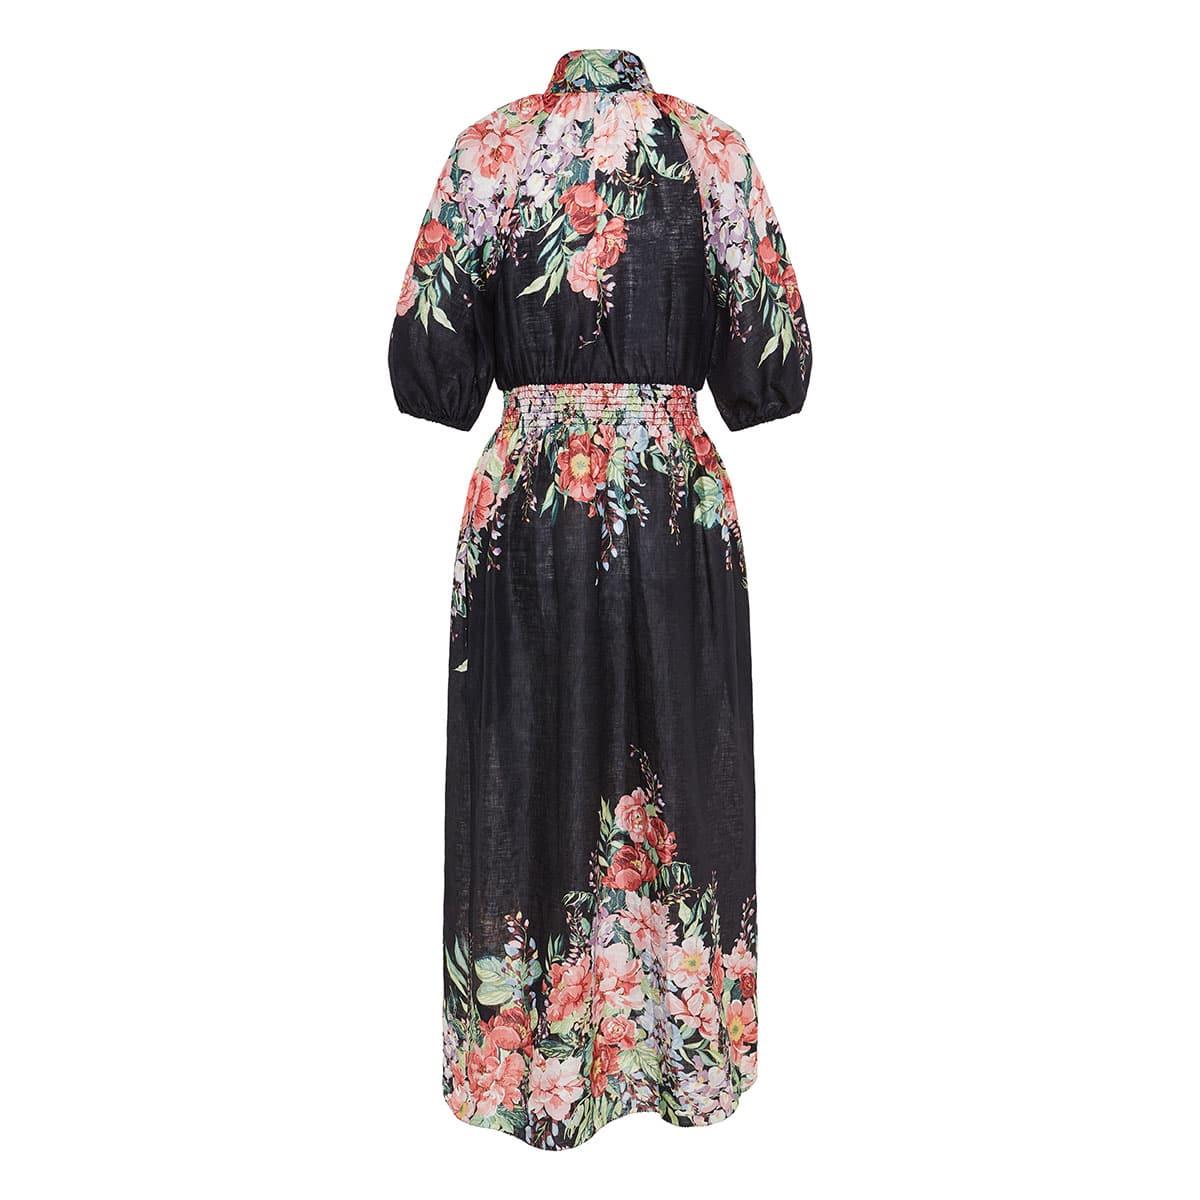 Bellitude floral linen midi dress